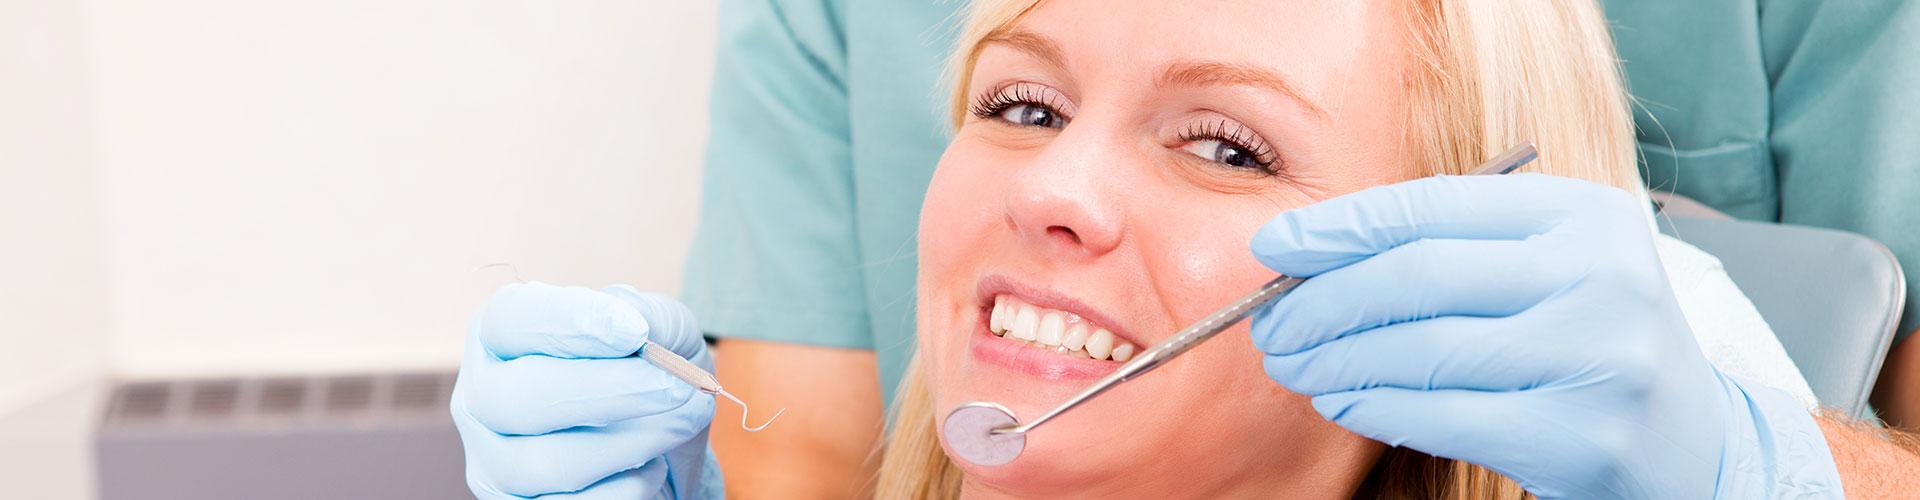 A woman having oral cancer treatments done at Bella Hanono Family Dentistry